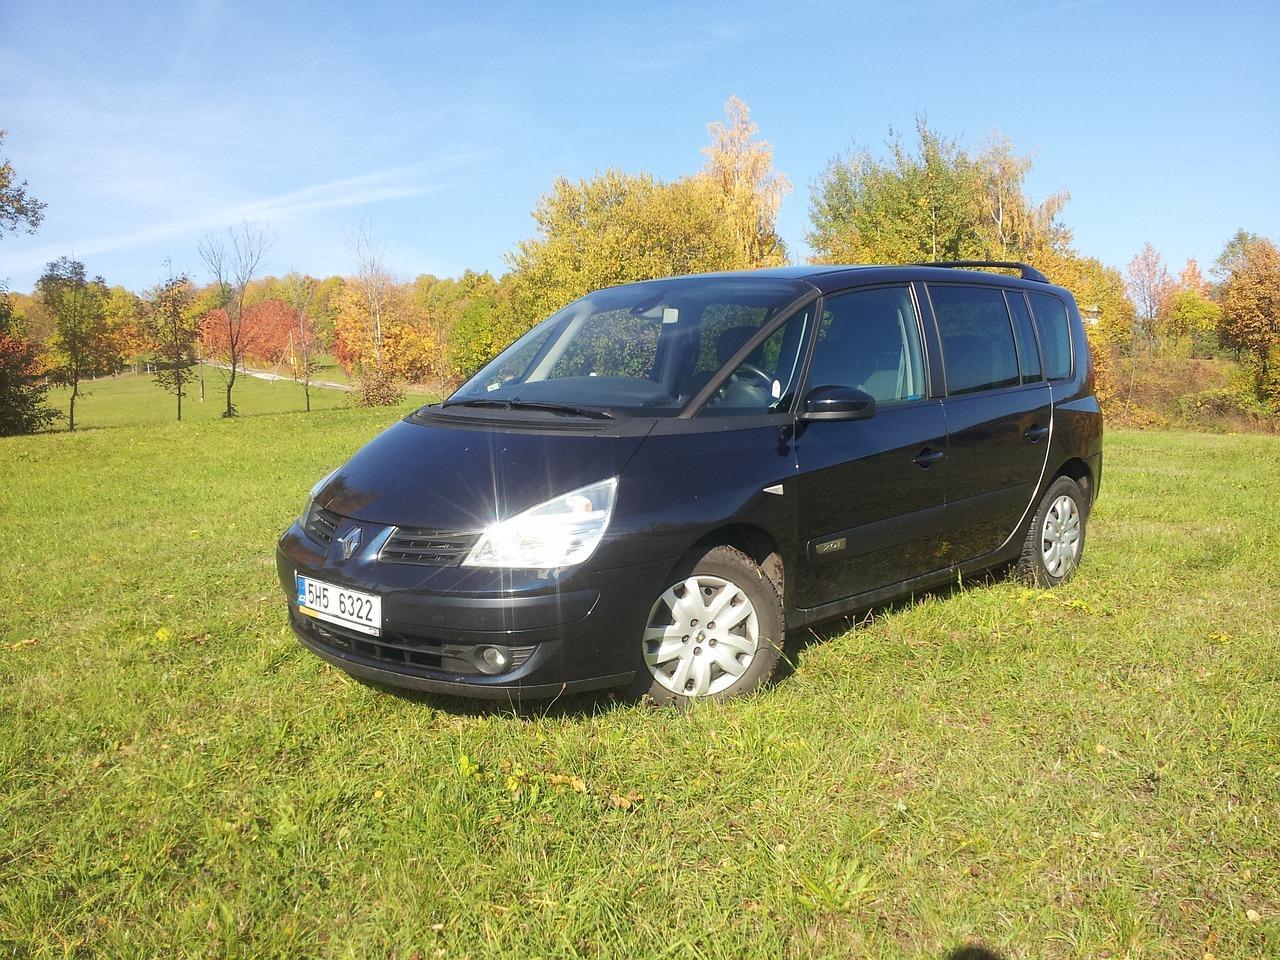 minivans-conforto-para-familias-e-grupos